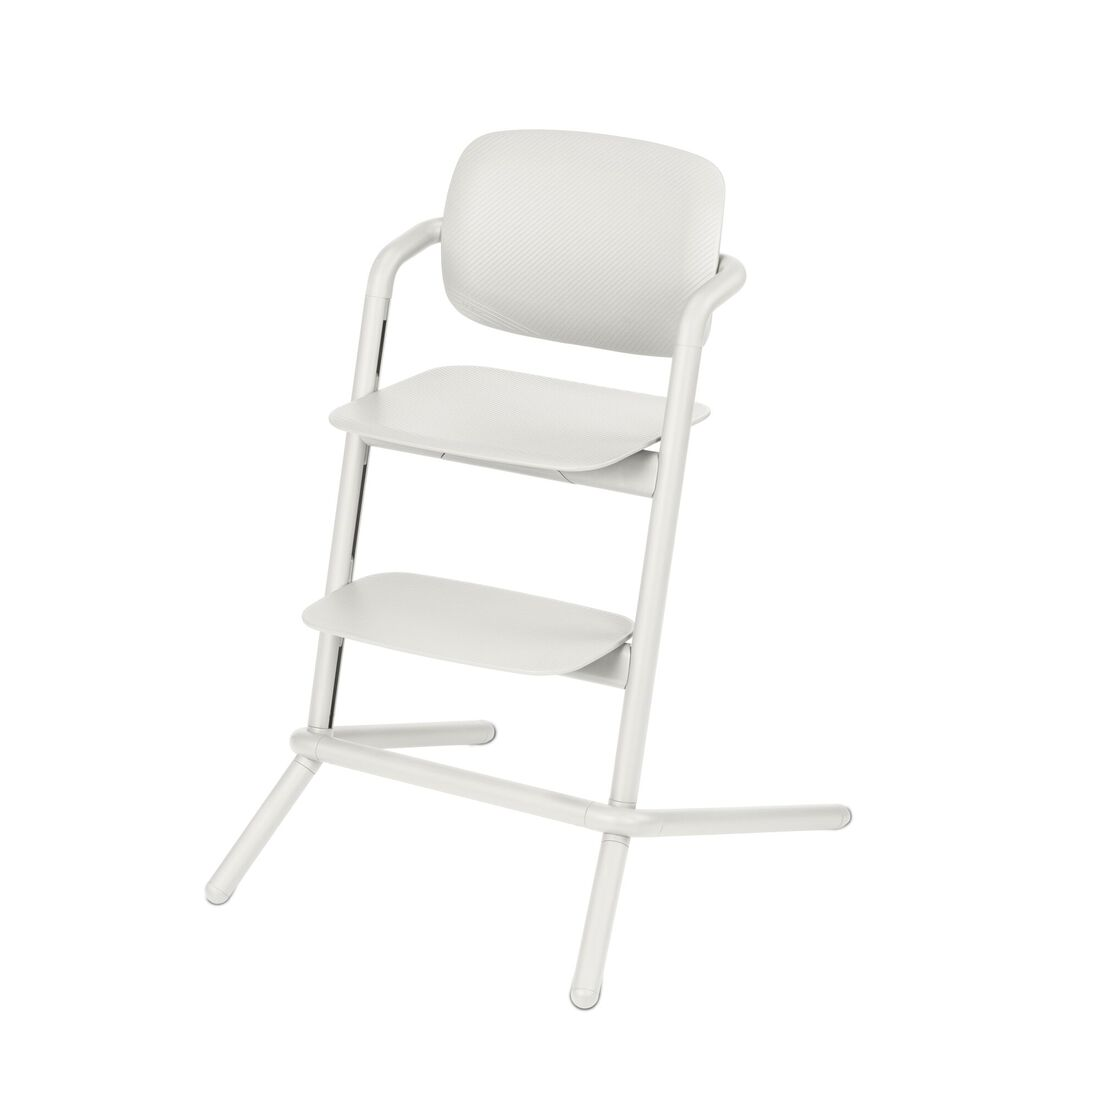 CYBEX Lemo Chair - Porcelaine White (Plastic) in Porcelaine White (Plastic) large